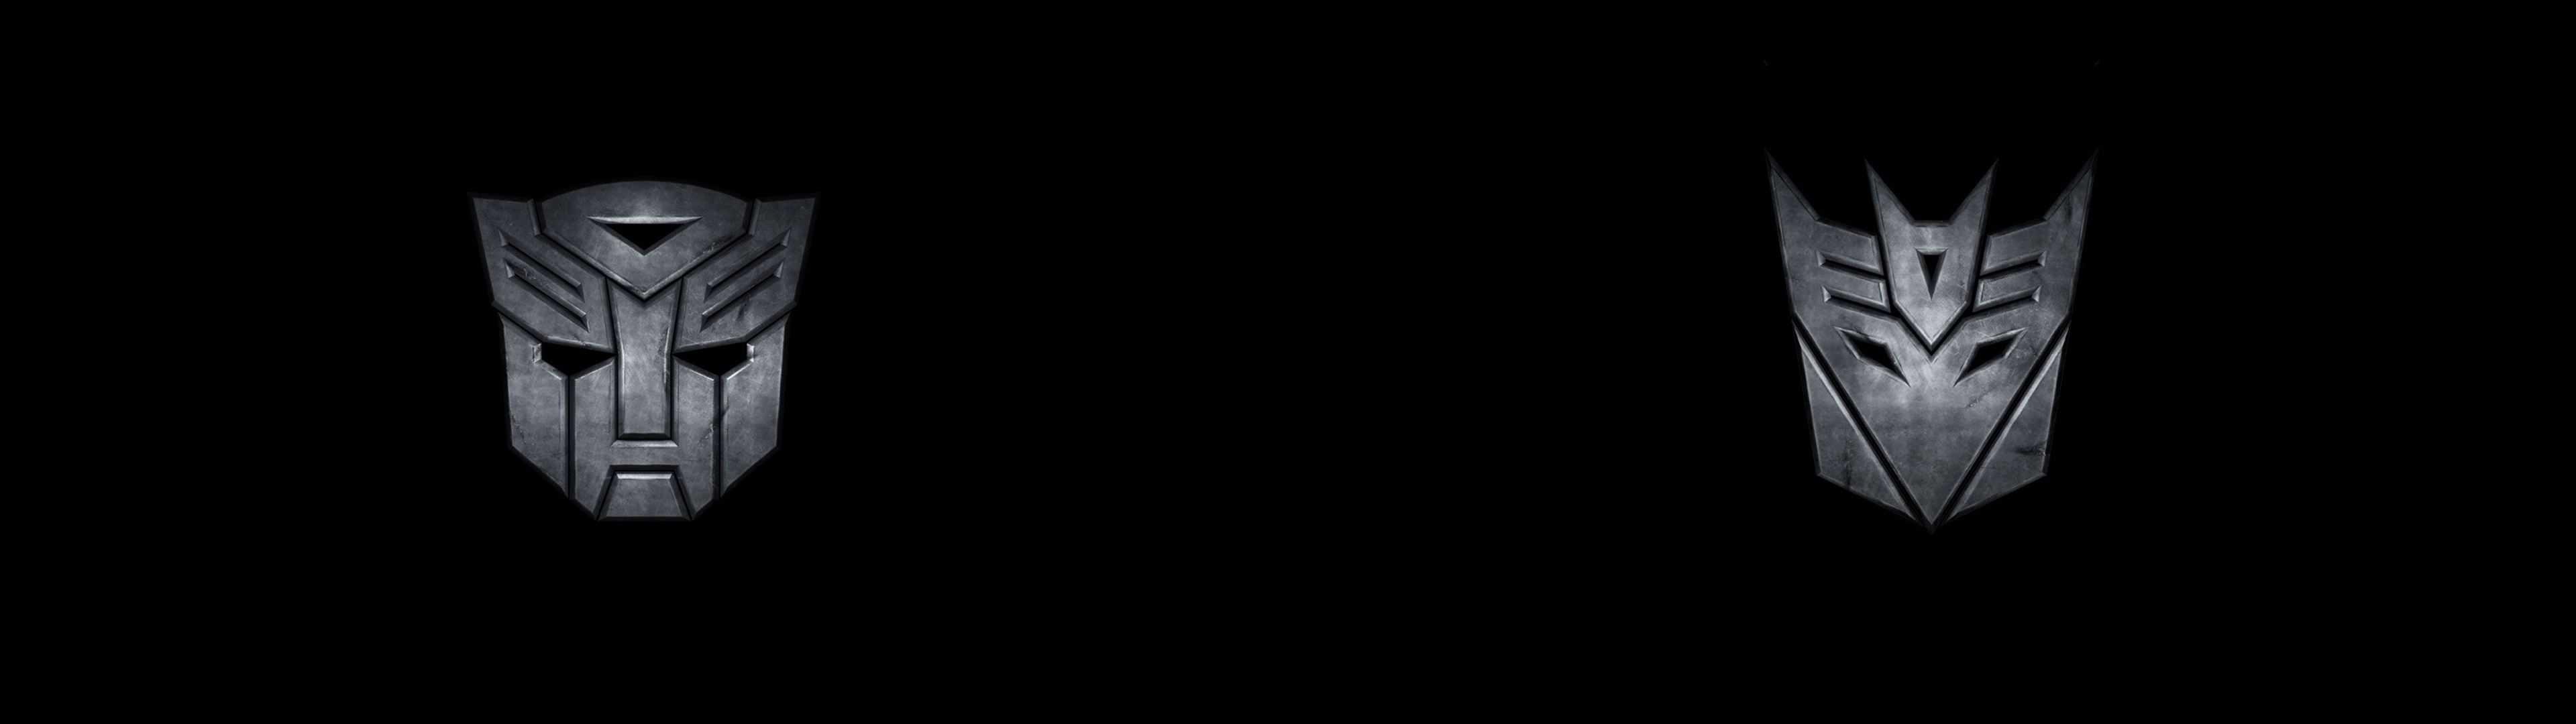 transformers autobot and decepticon symbol dual monitor wallpaper